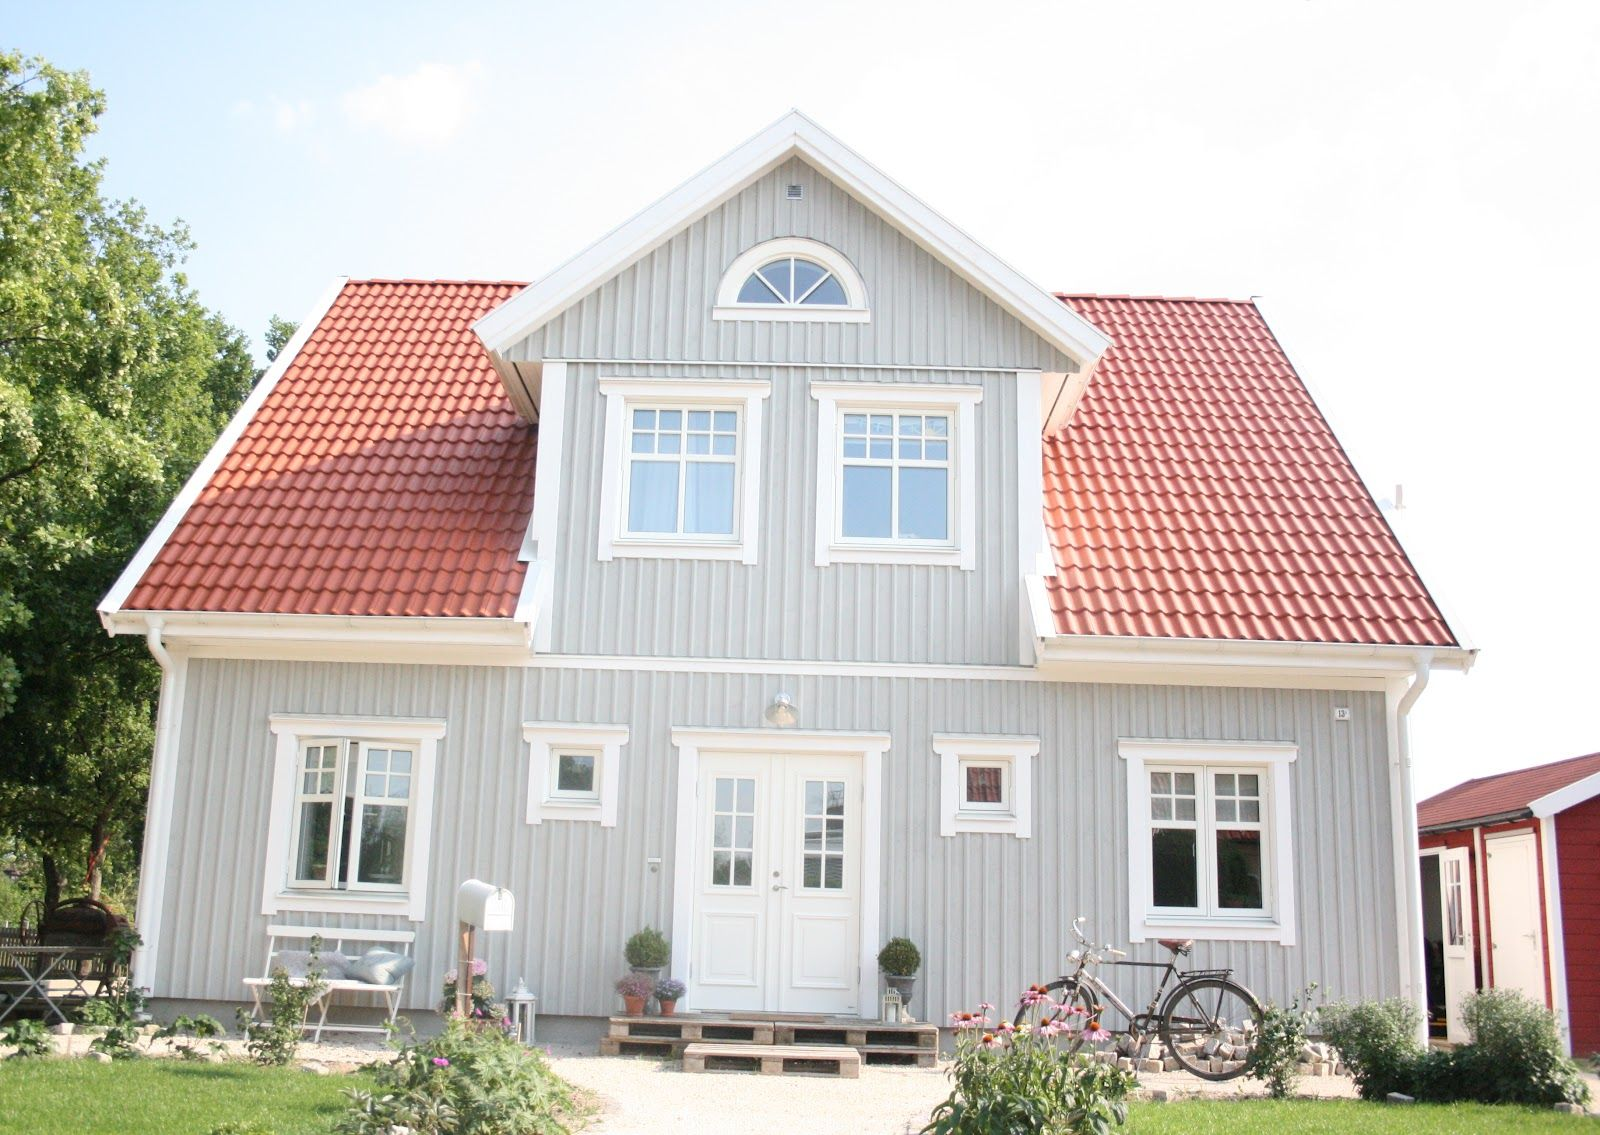 Best Lille Sverige Hus Hus Färger House Ideas Drömhus 400 x 300